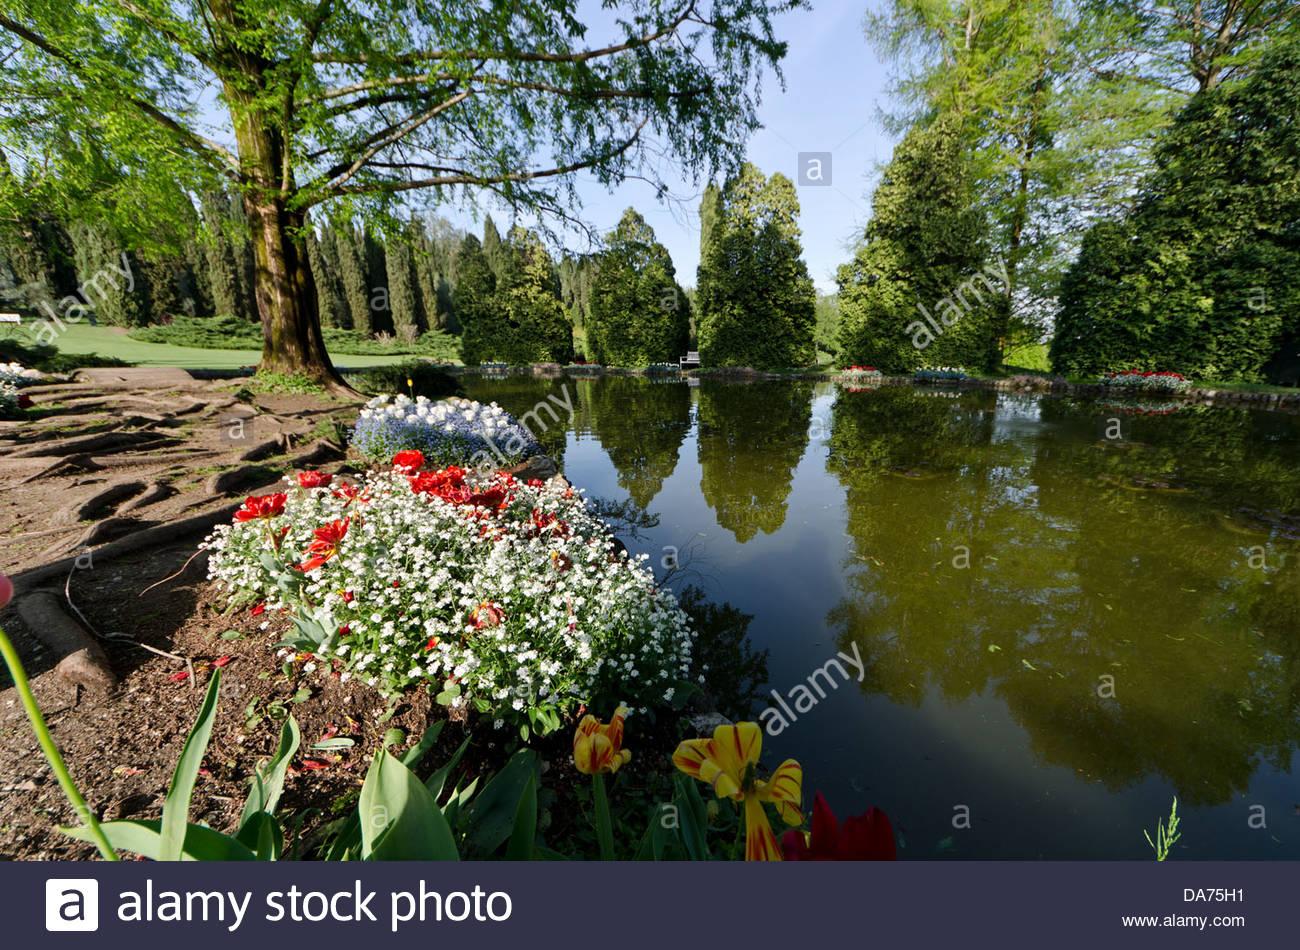 Parco giardino sigurt valeggio sul mincio veneto italy stock photo royalty free image - Parco giardino sigurta valeggio sul mincio vr ...